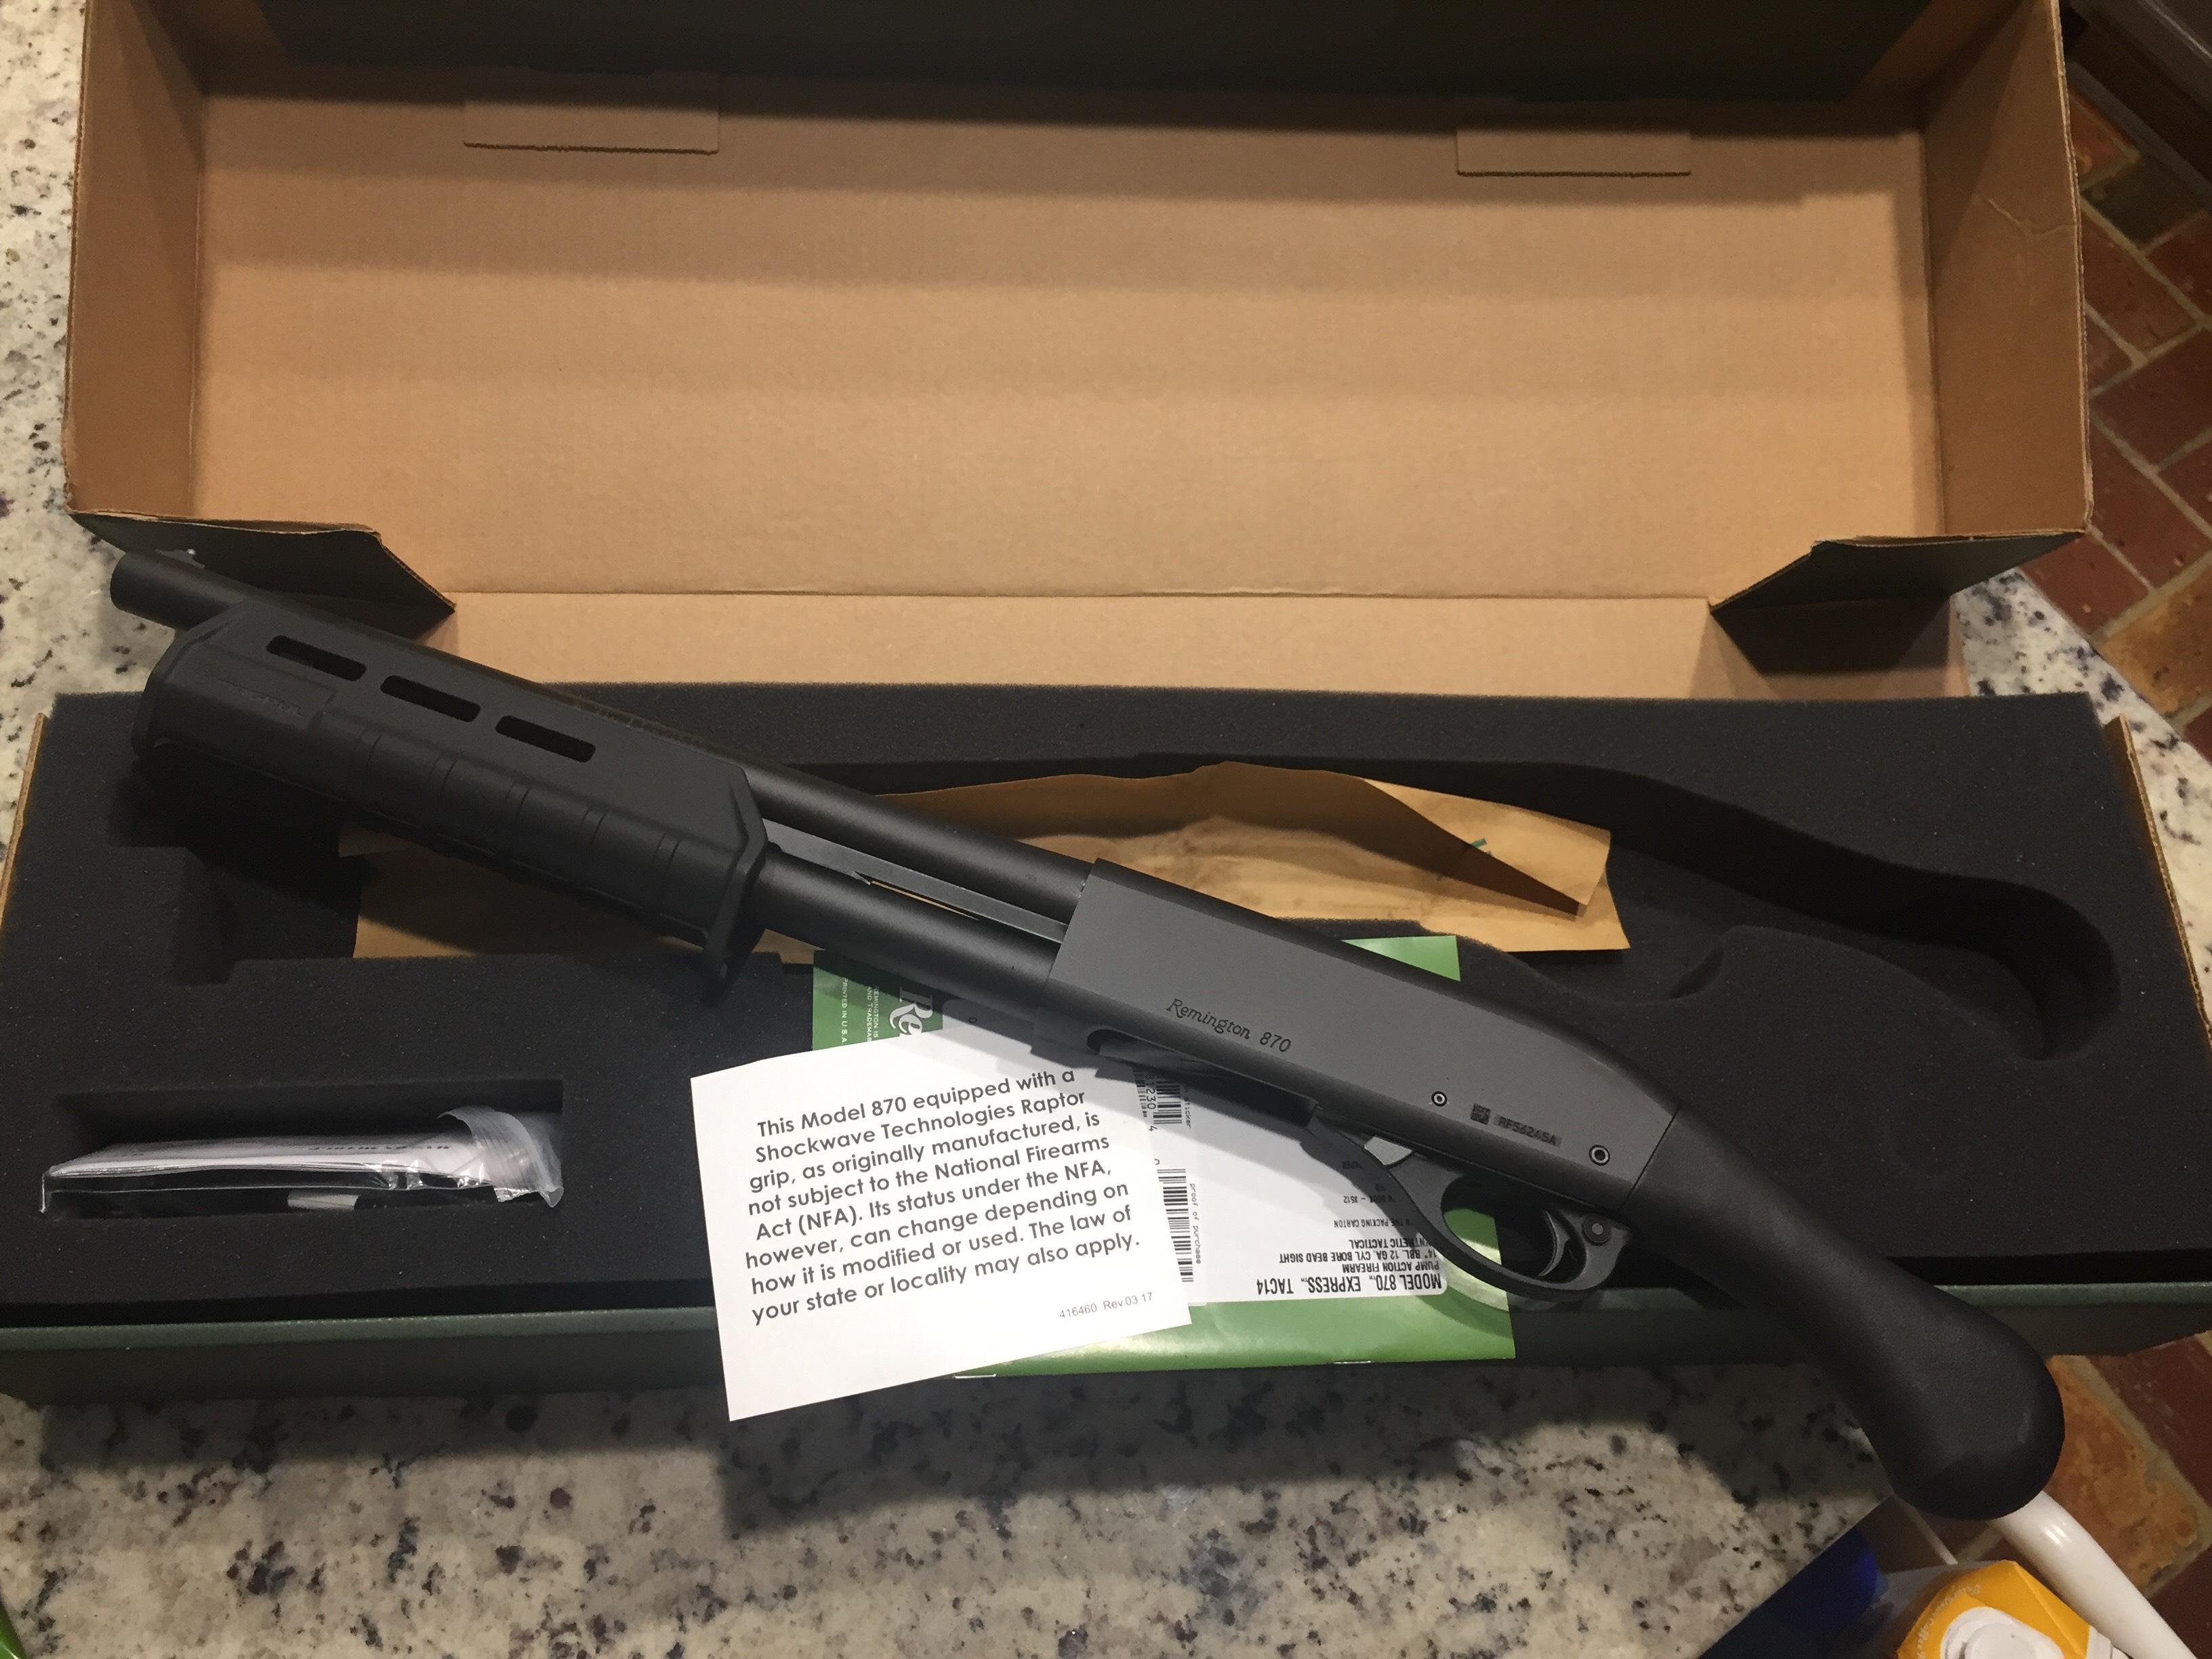 BNIB Remington TAC-14 12 Gauge with Scabbard $340 in Ocean